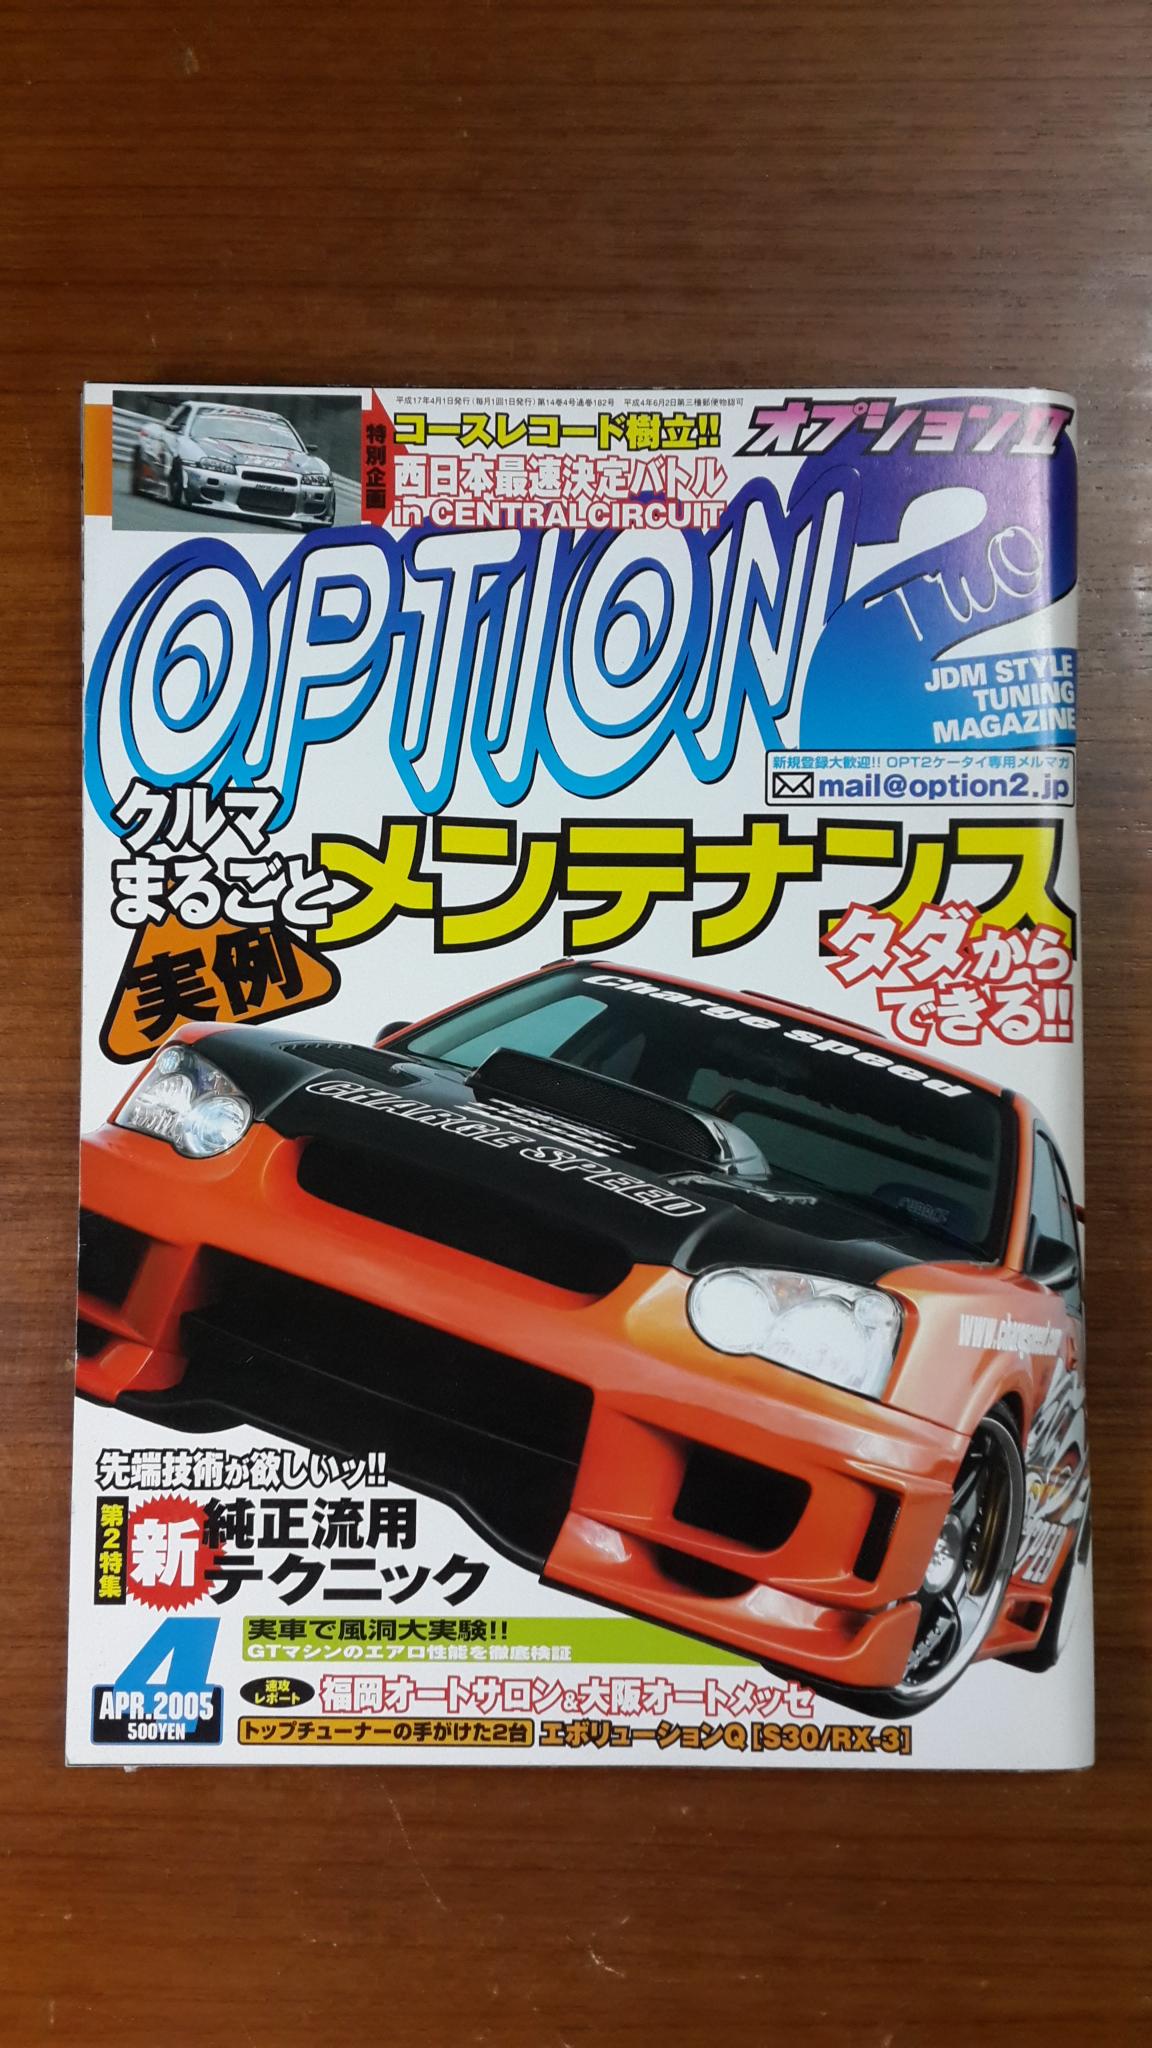 OPTION TWO 2 (Japan) : 2005 / 4